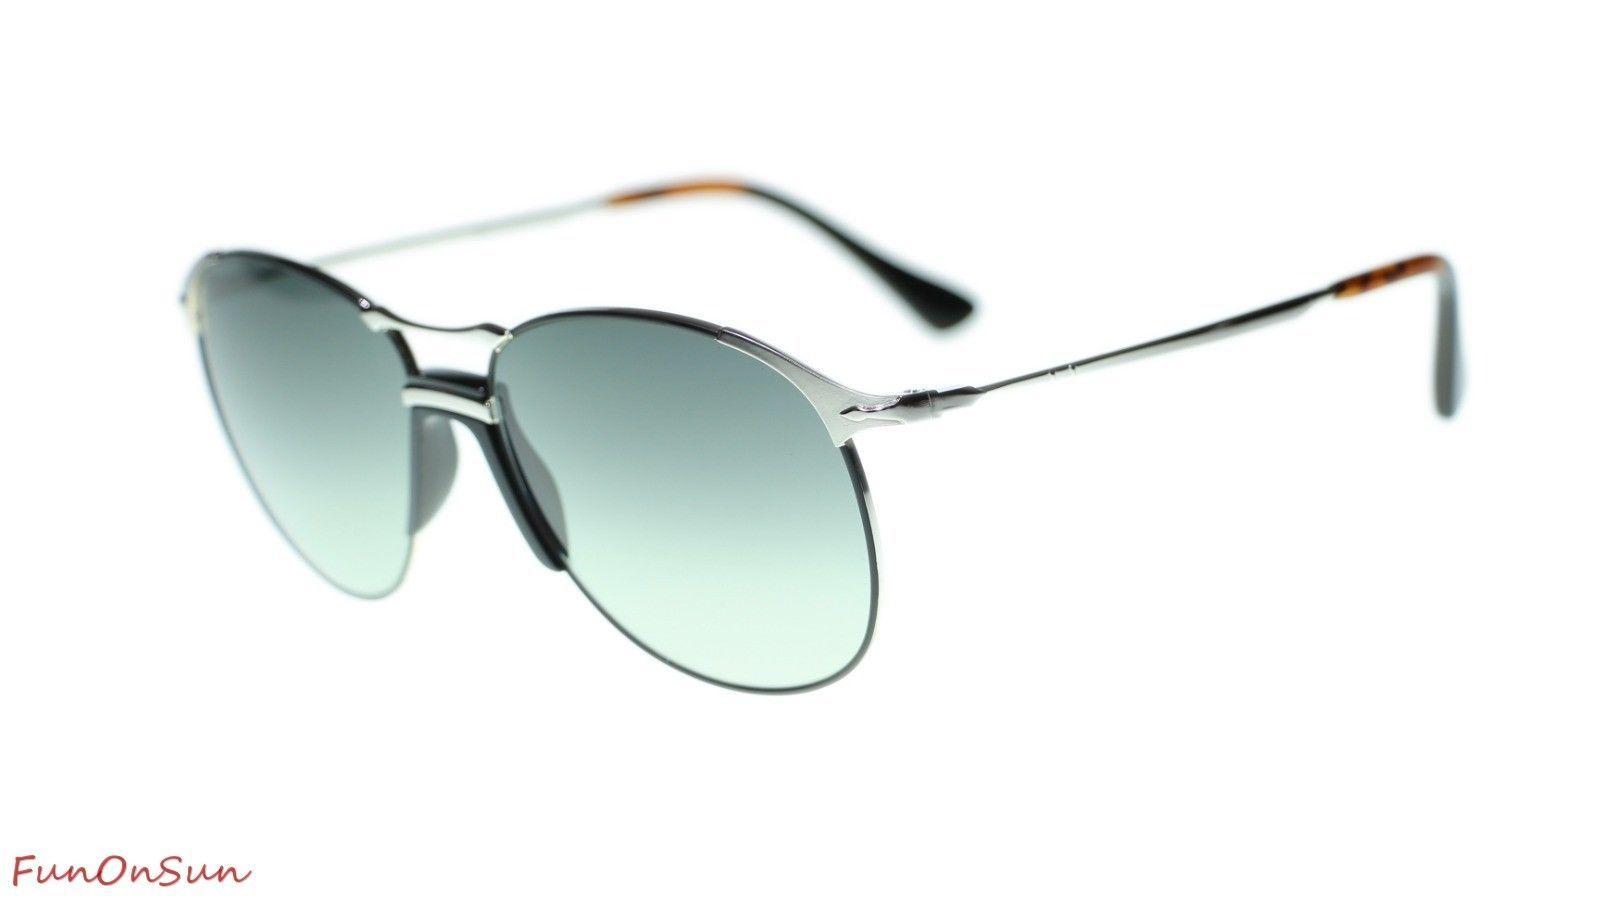 f514150c1fff3 Persol Mens Sunglasses PO2649S 107471 Silver and 12 similar items. 10